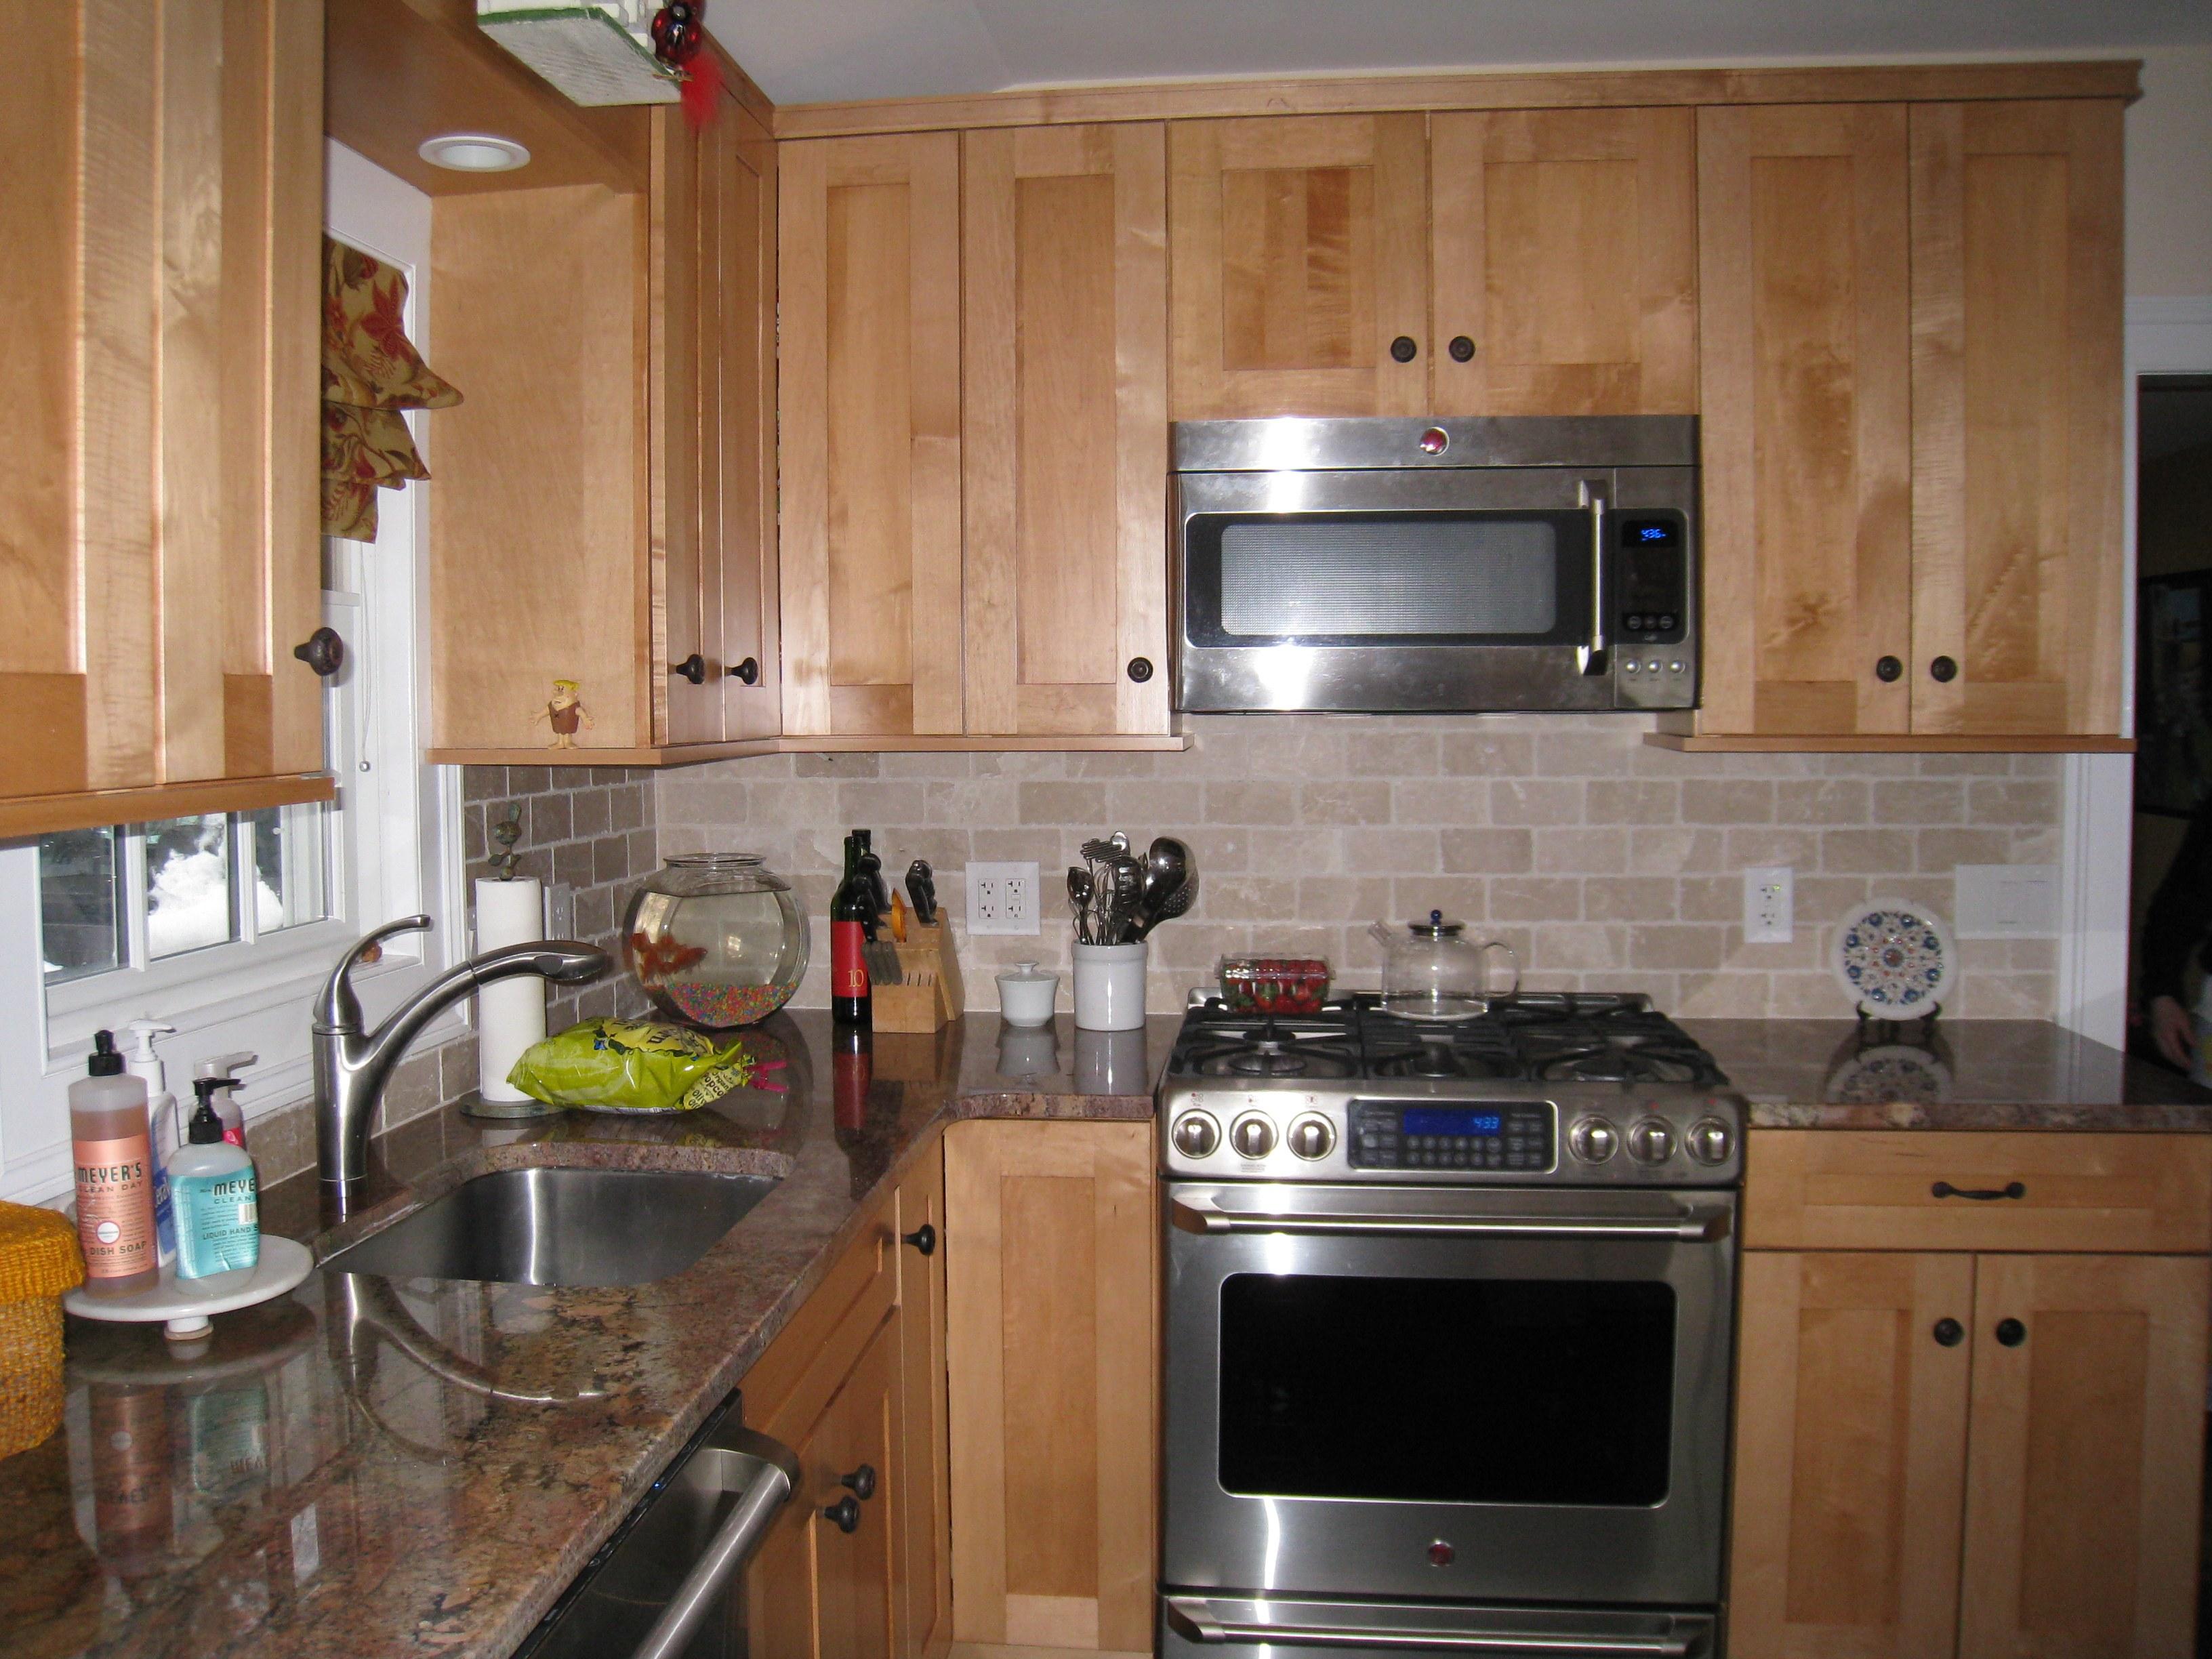 Elegant Brick Backsplash in the Kitchen Presented with ... on Backsplash Ideas For Maple Cabinets  id=42905